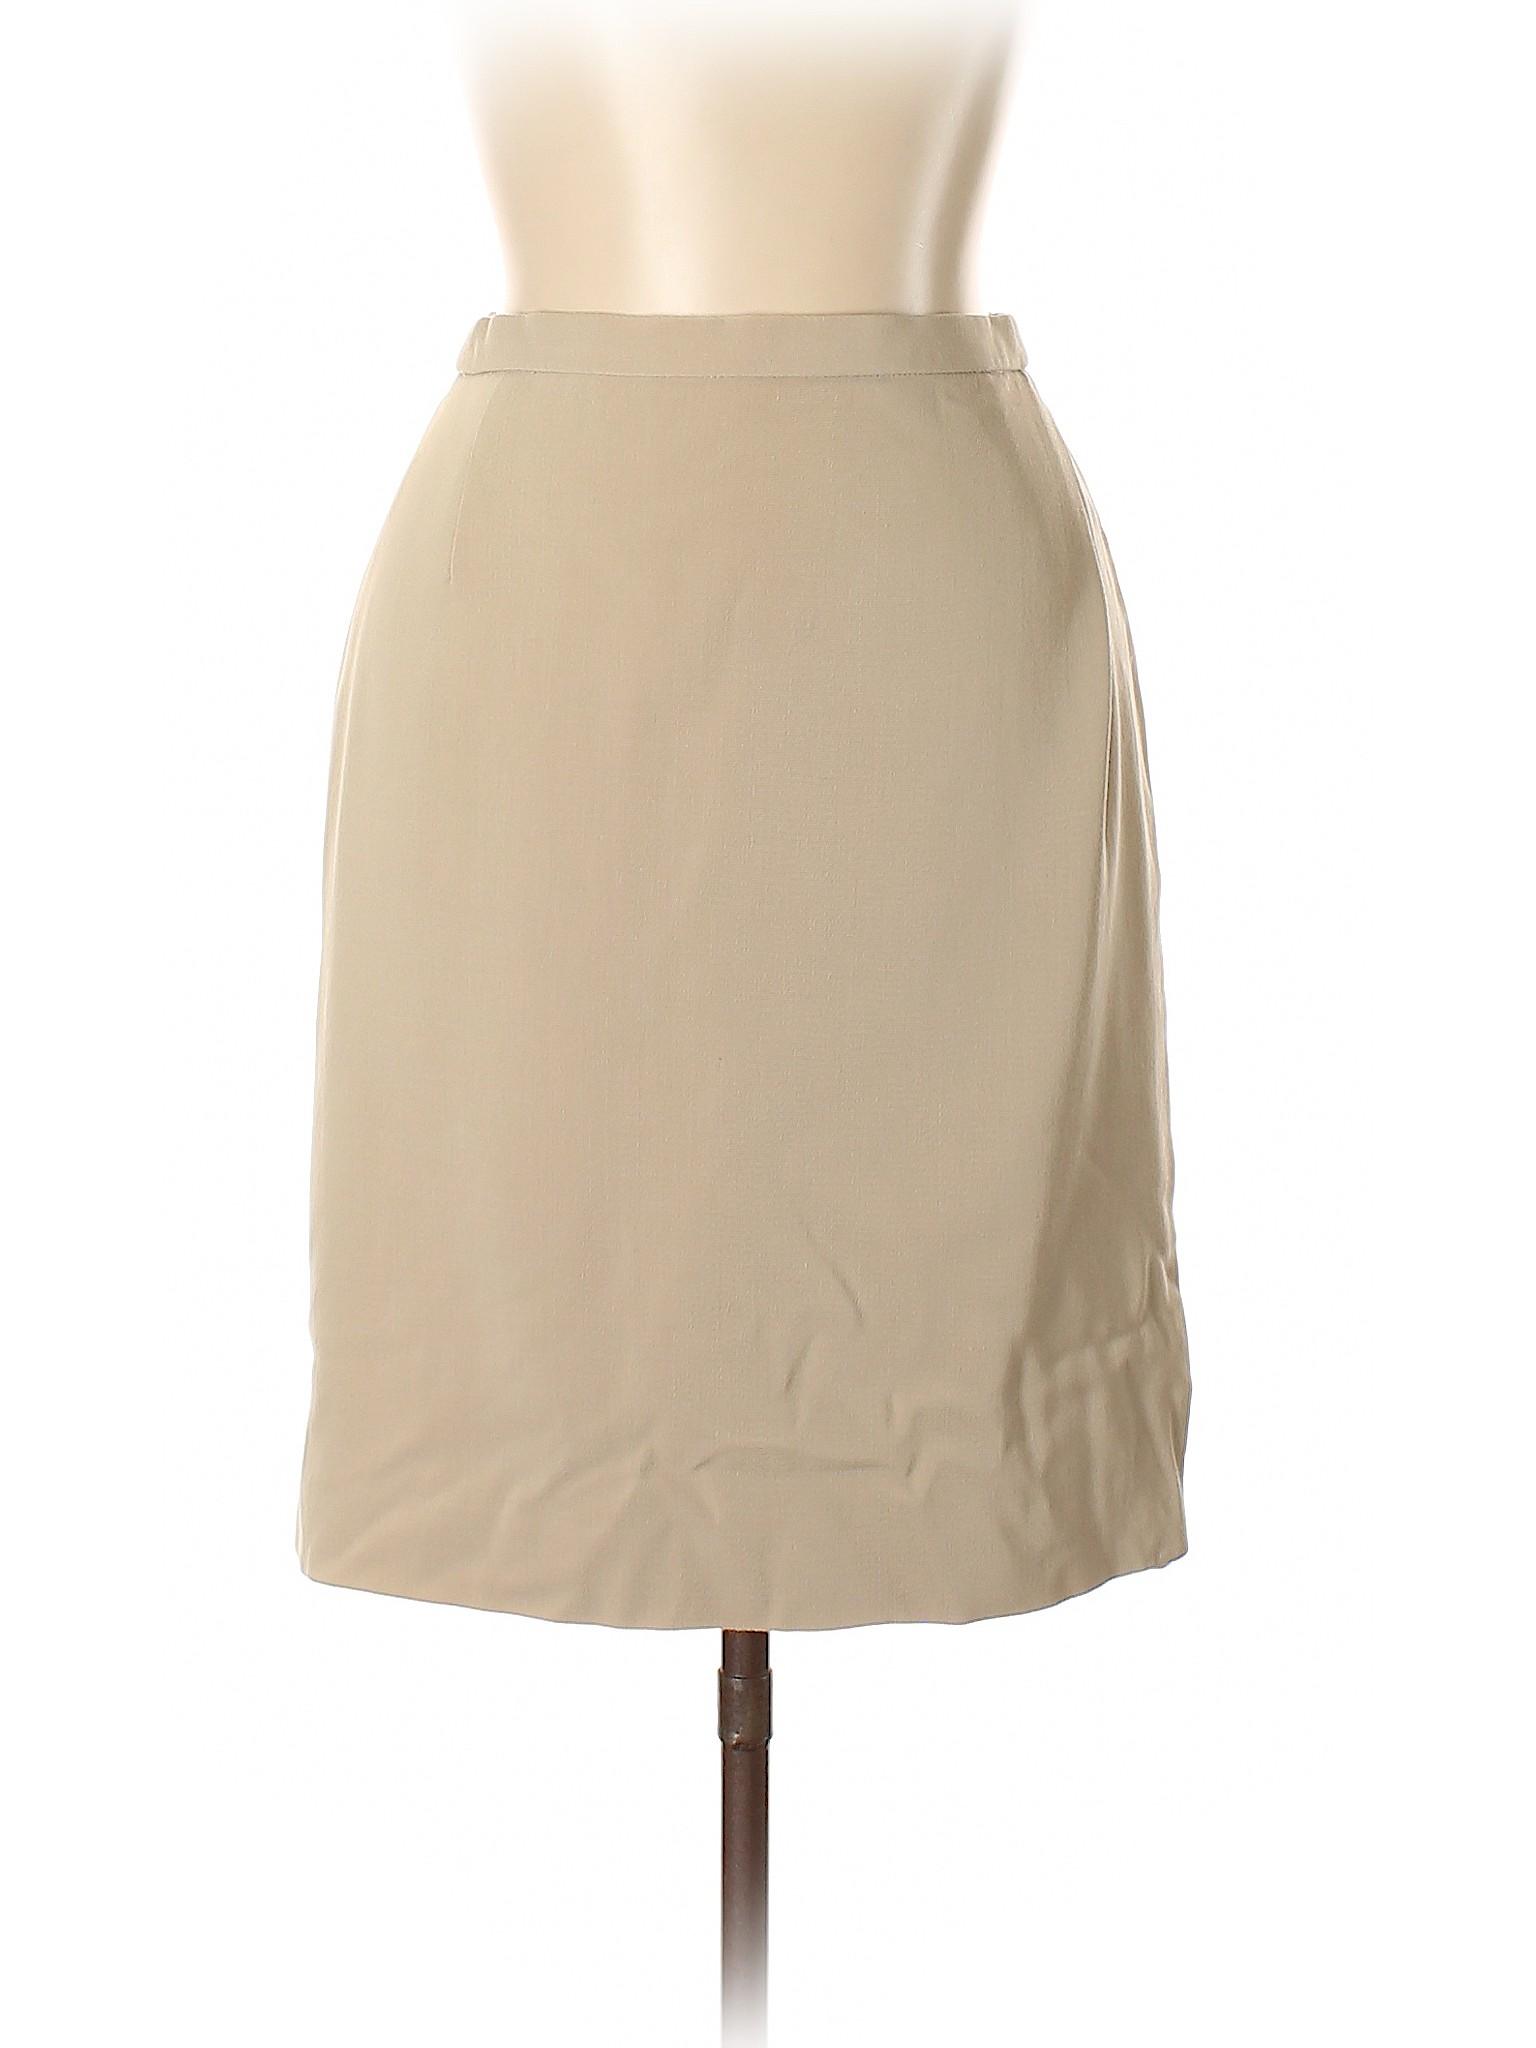 Skirt Giorgio Armani Armani Wool Giorgio Boutique Boutique Skirt Boutique Wool Wool Skirt Boutique Armani Giorgio XARxRSwq1